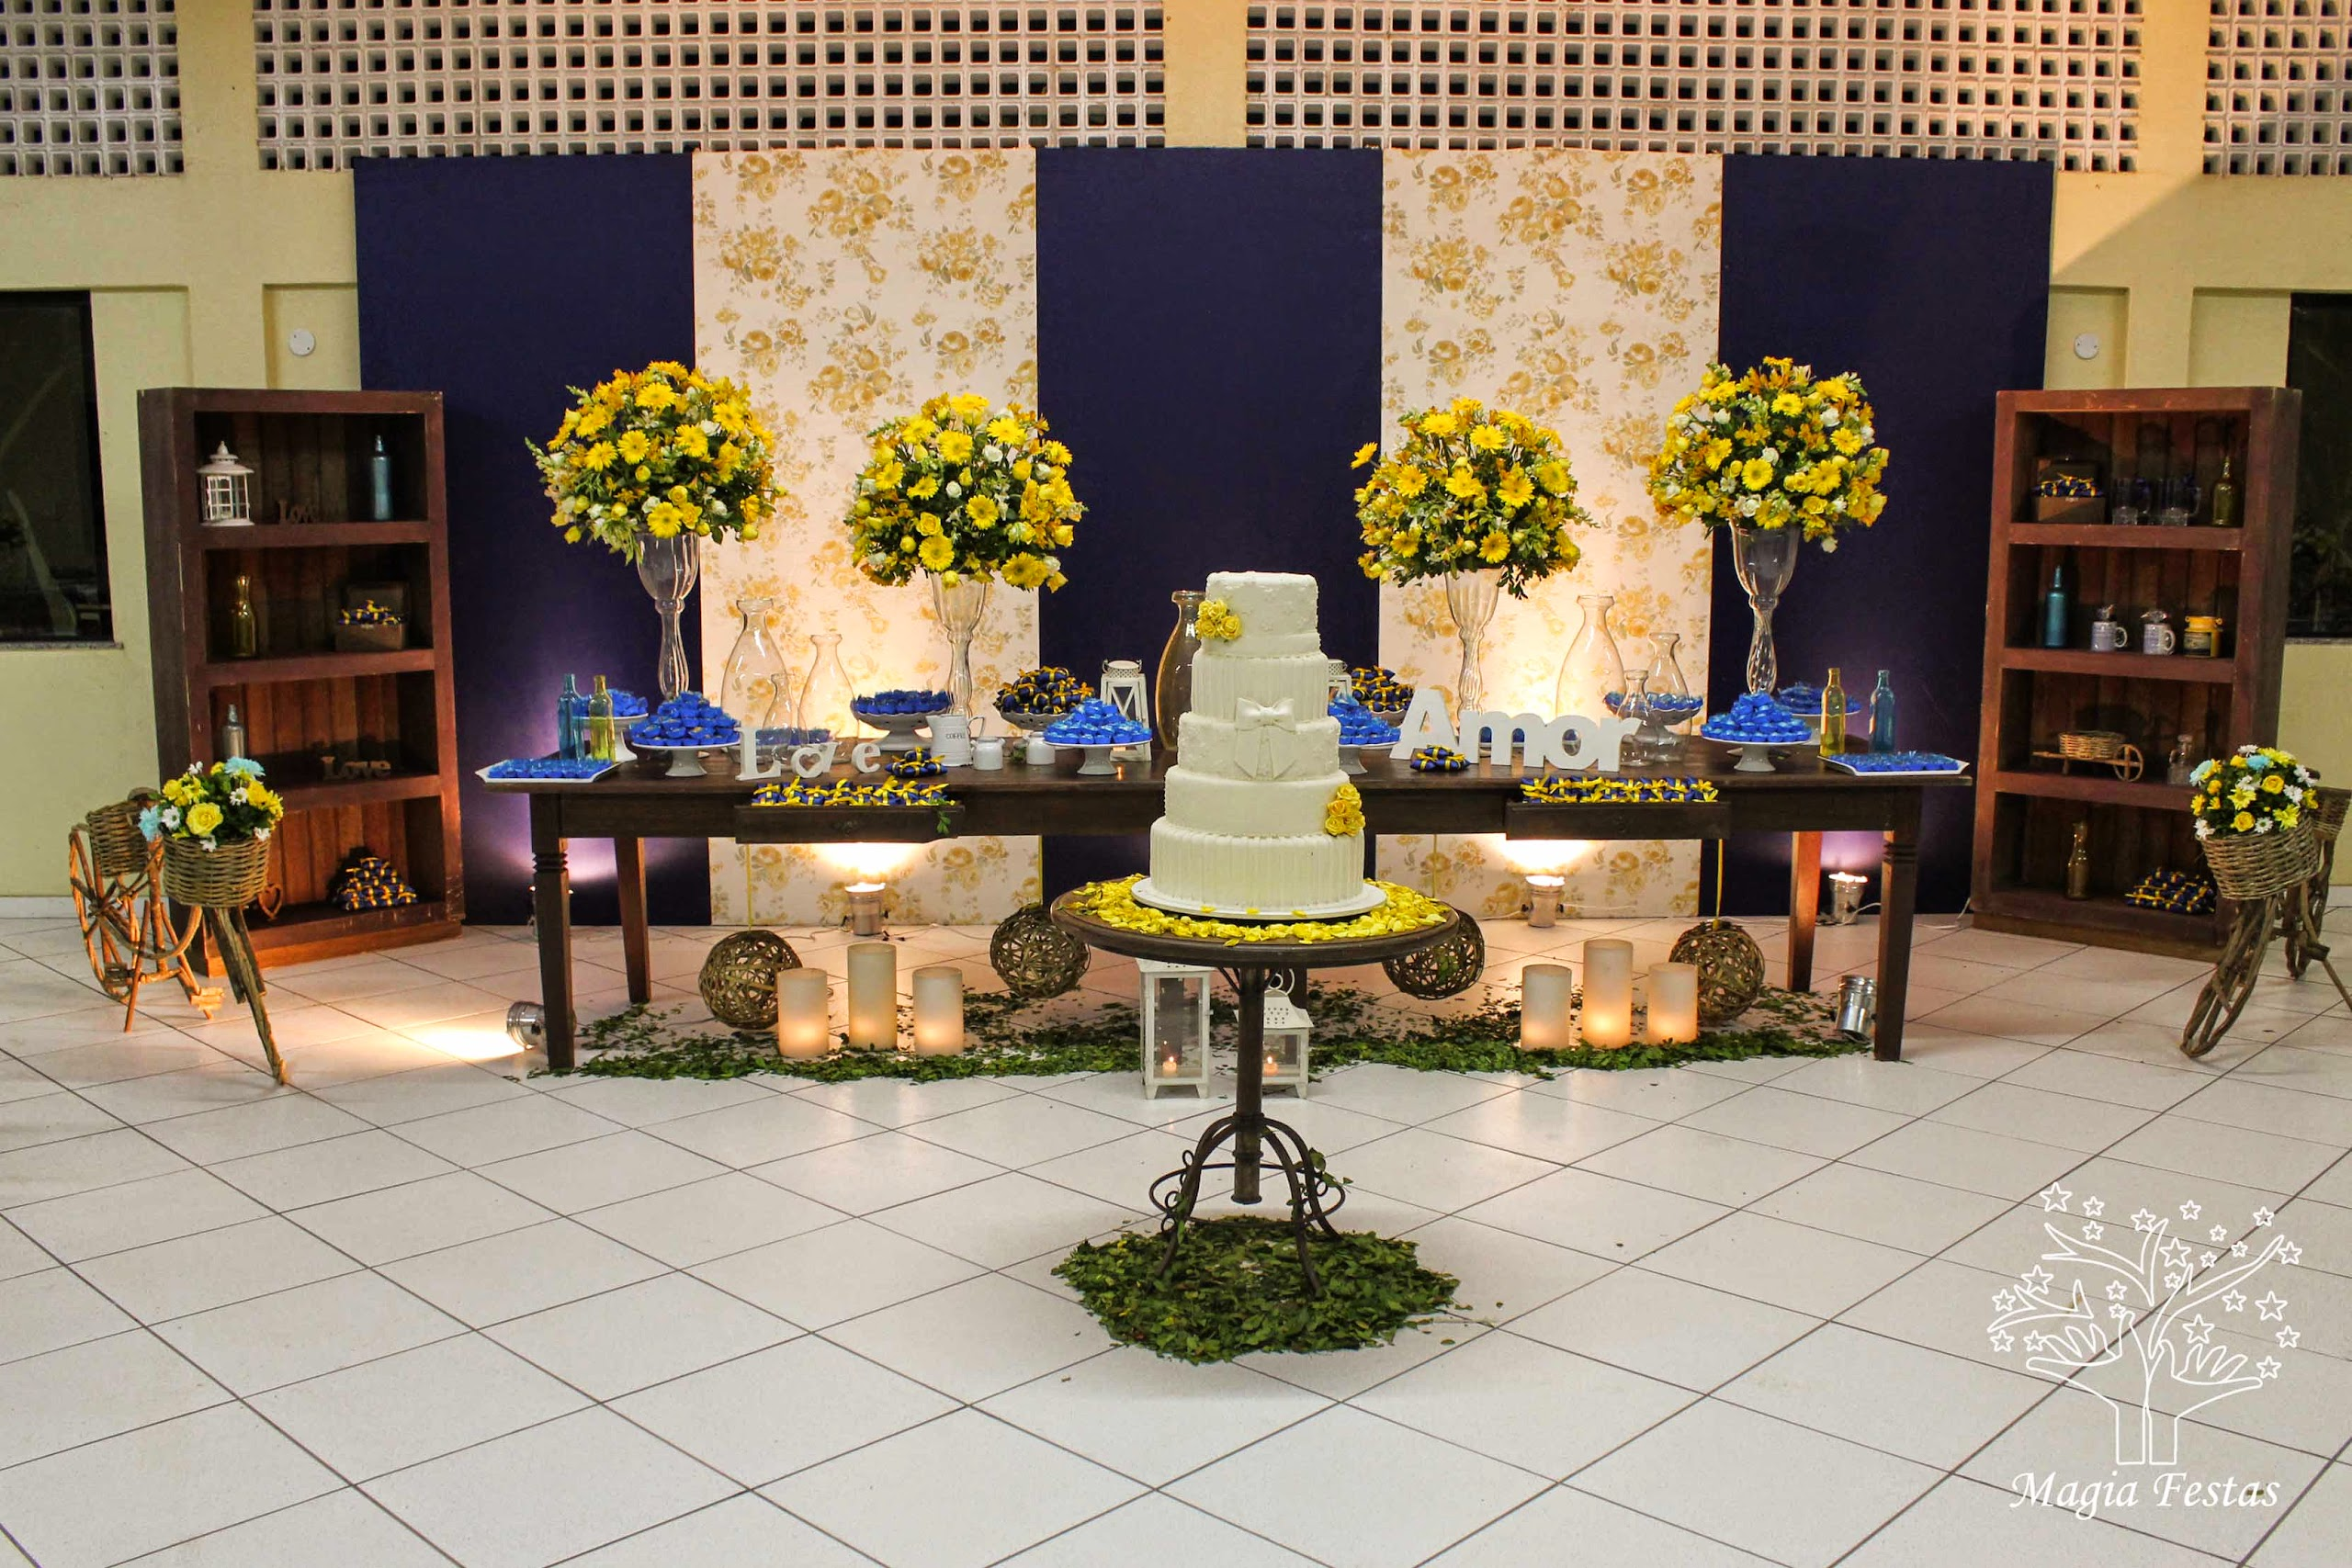 decoracao de igreja para casamento azul e amarelo:quinta-feira, 29 de maio de 2014